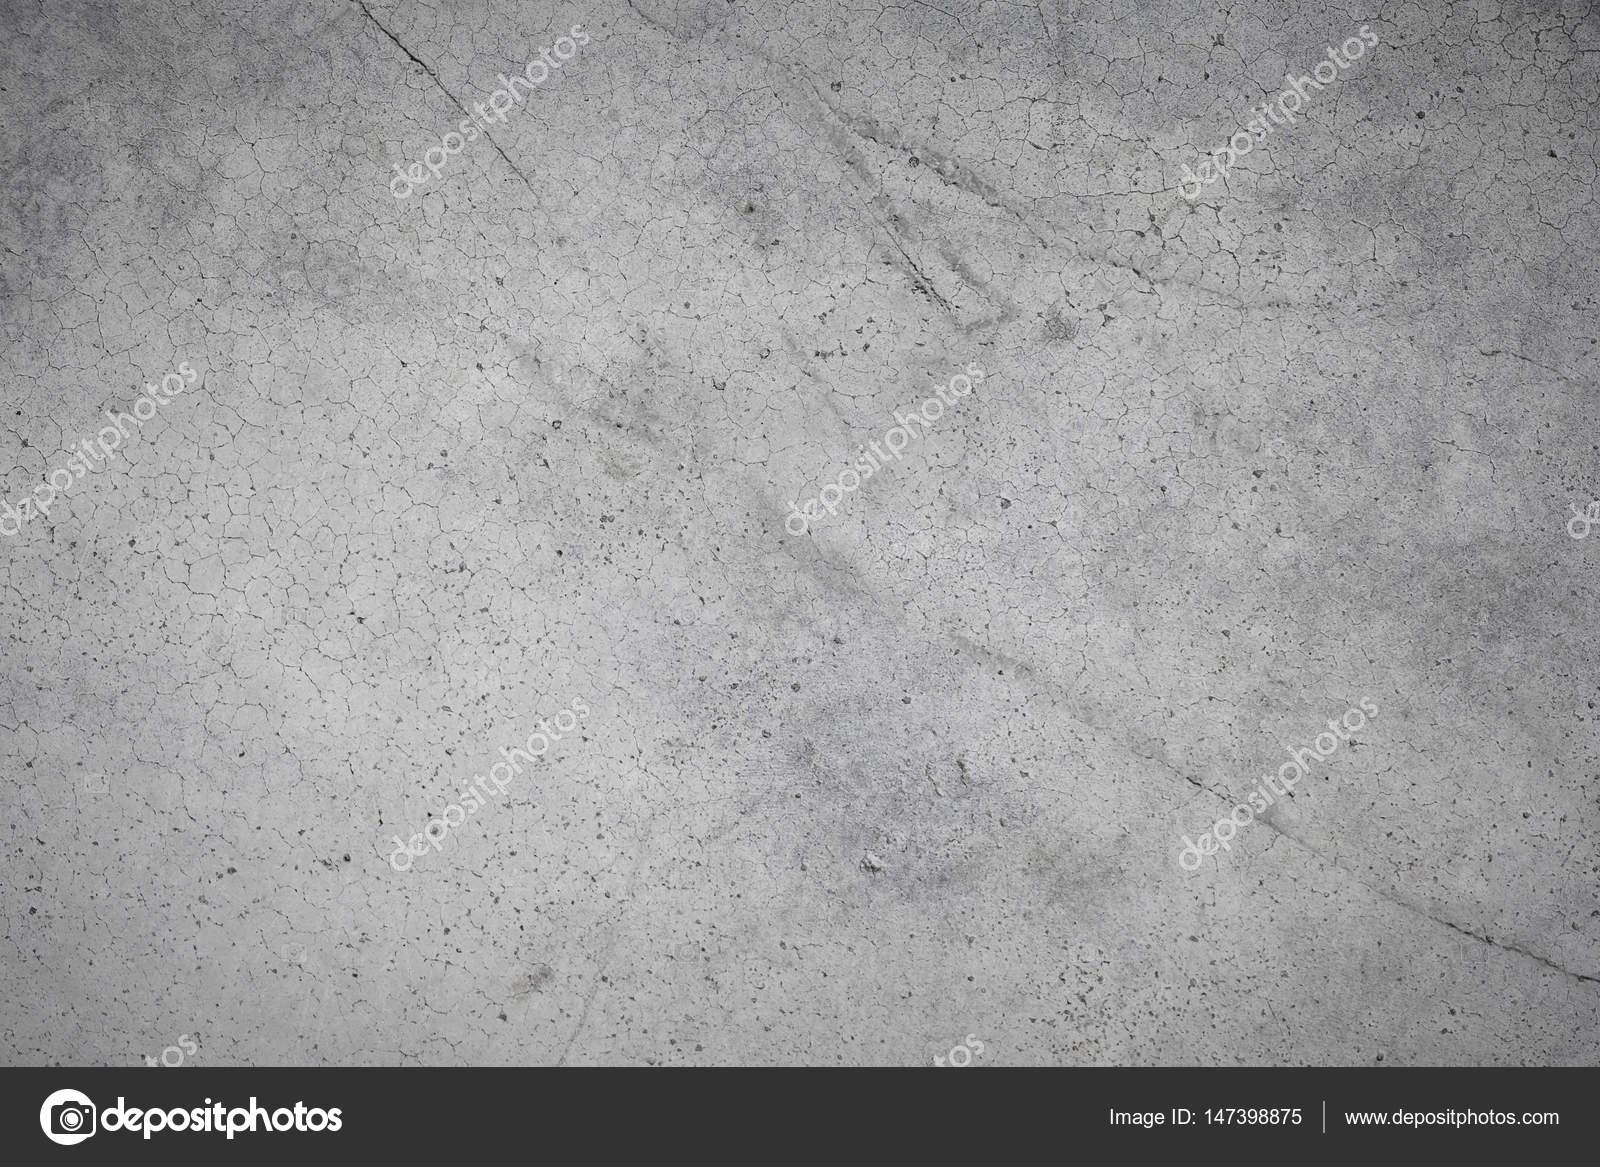 Textura hormig n pulido exterior foto de stock chingraph 147398875 - Hormigon pulido exterior ...